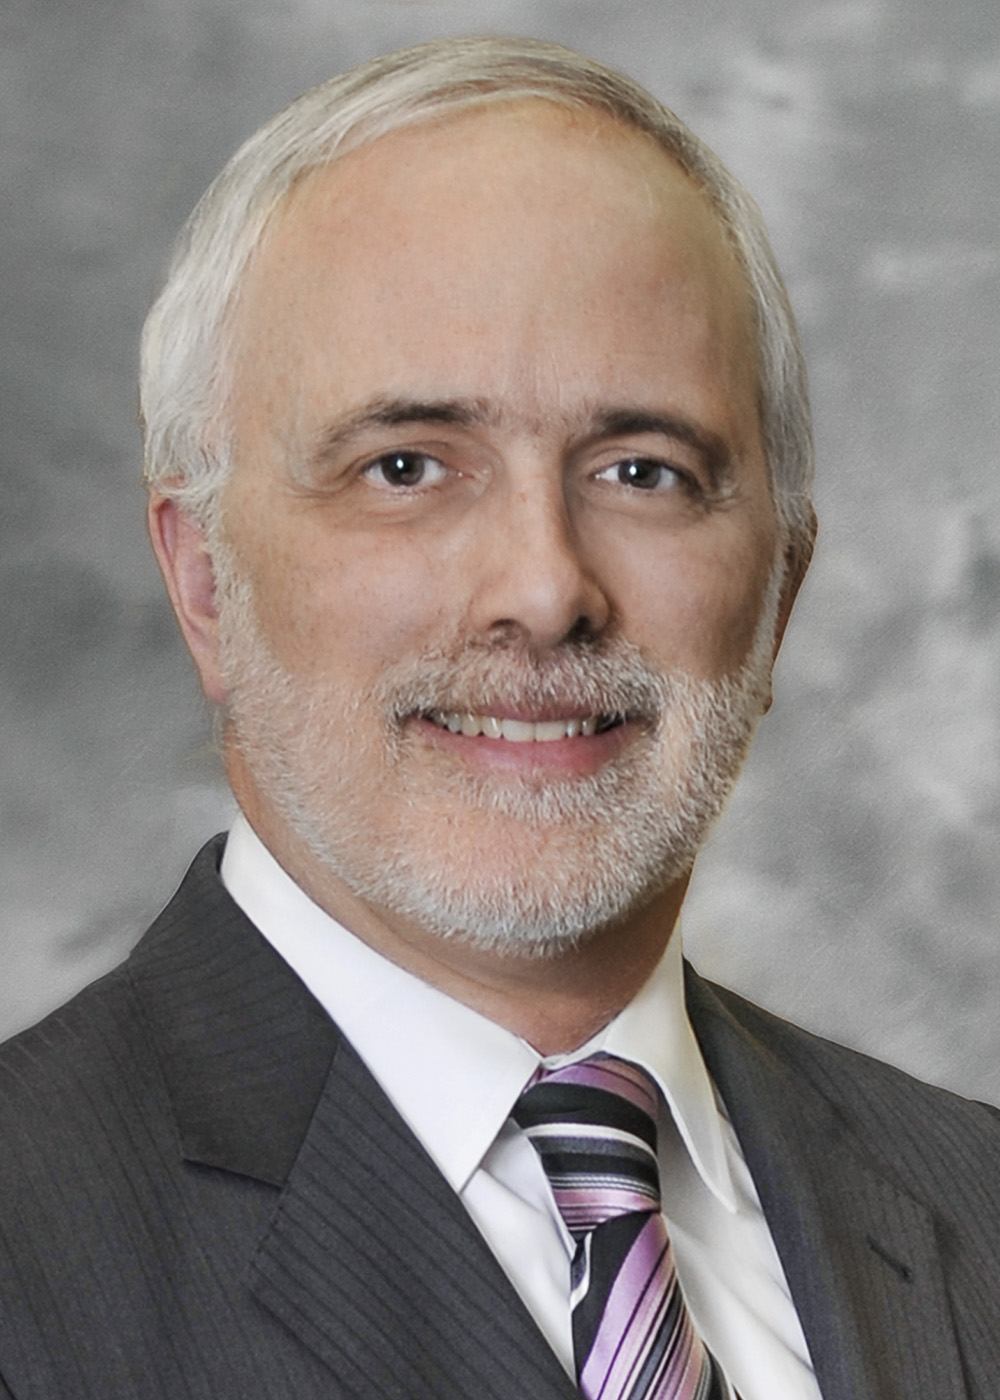 Dr. Henry Sachs